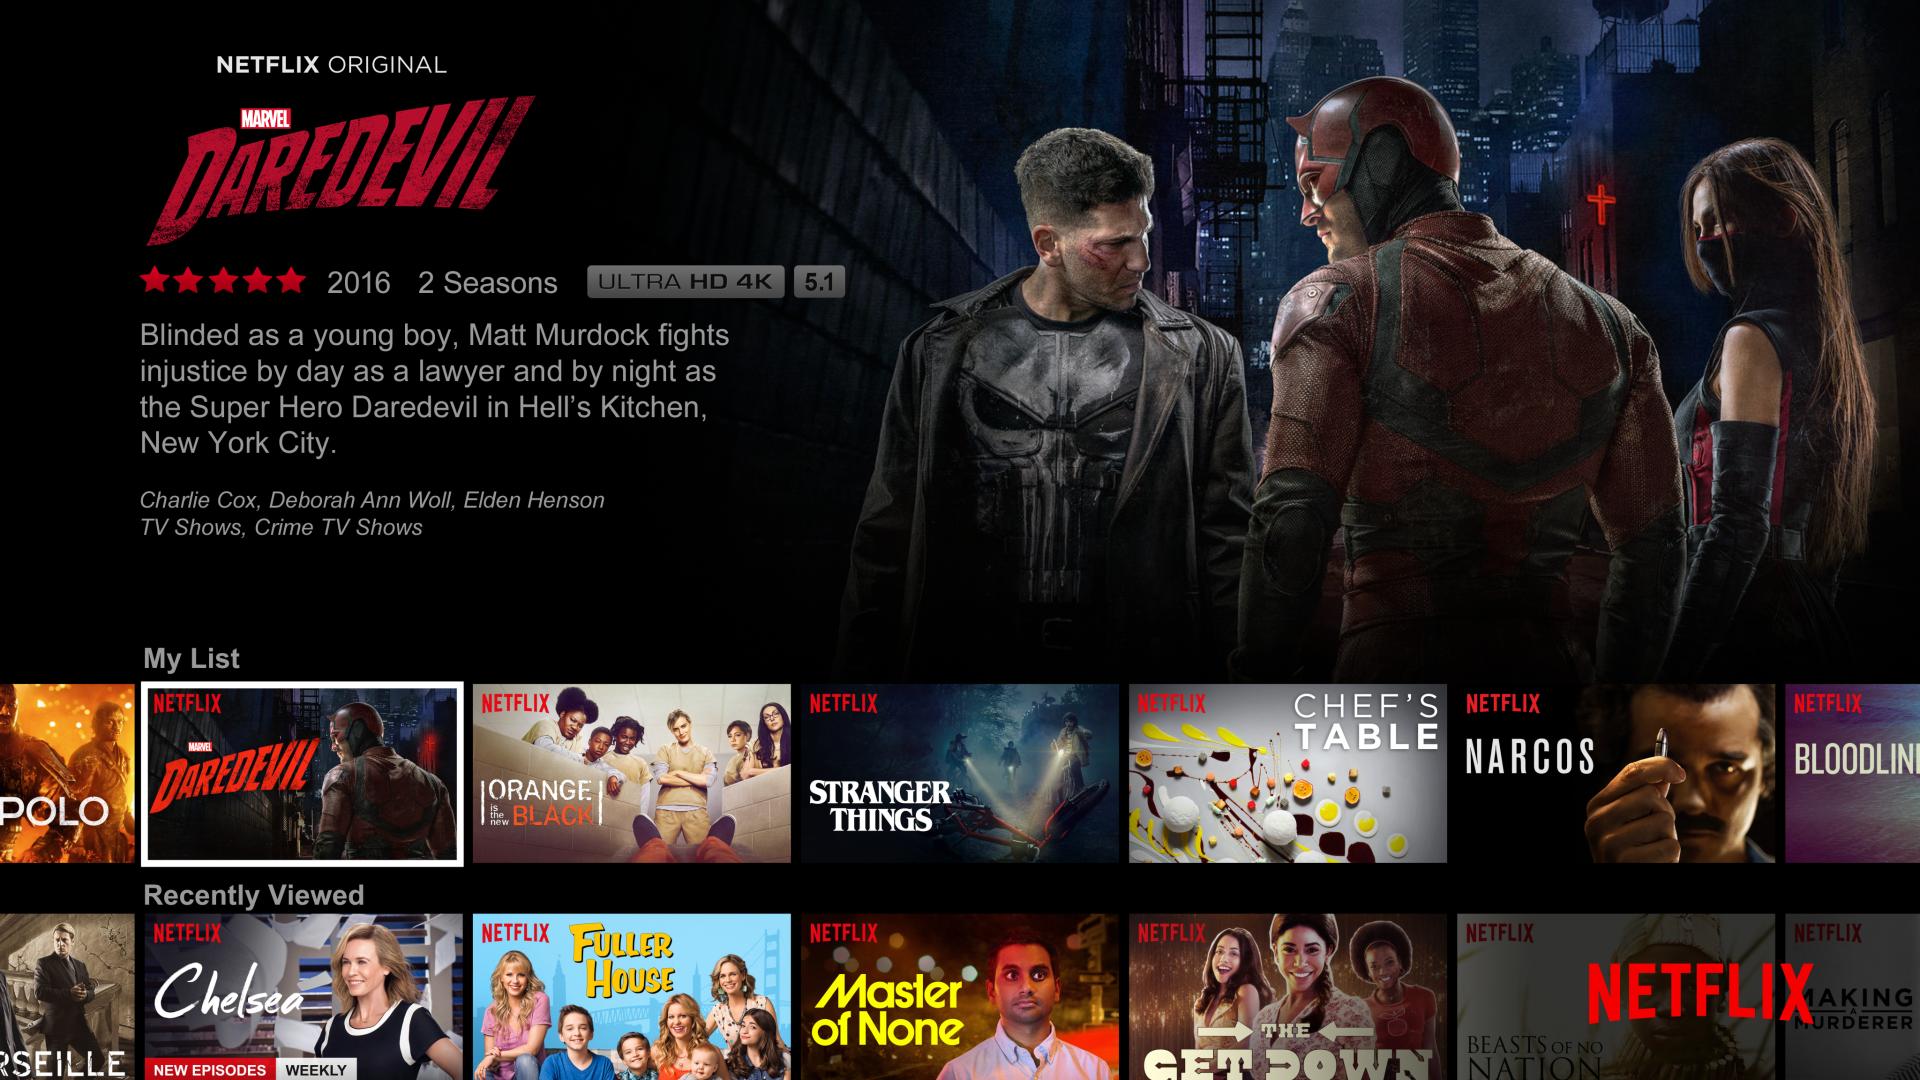 Marvel's Daredevil on Netflix.